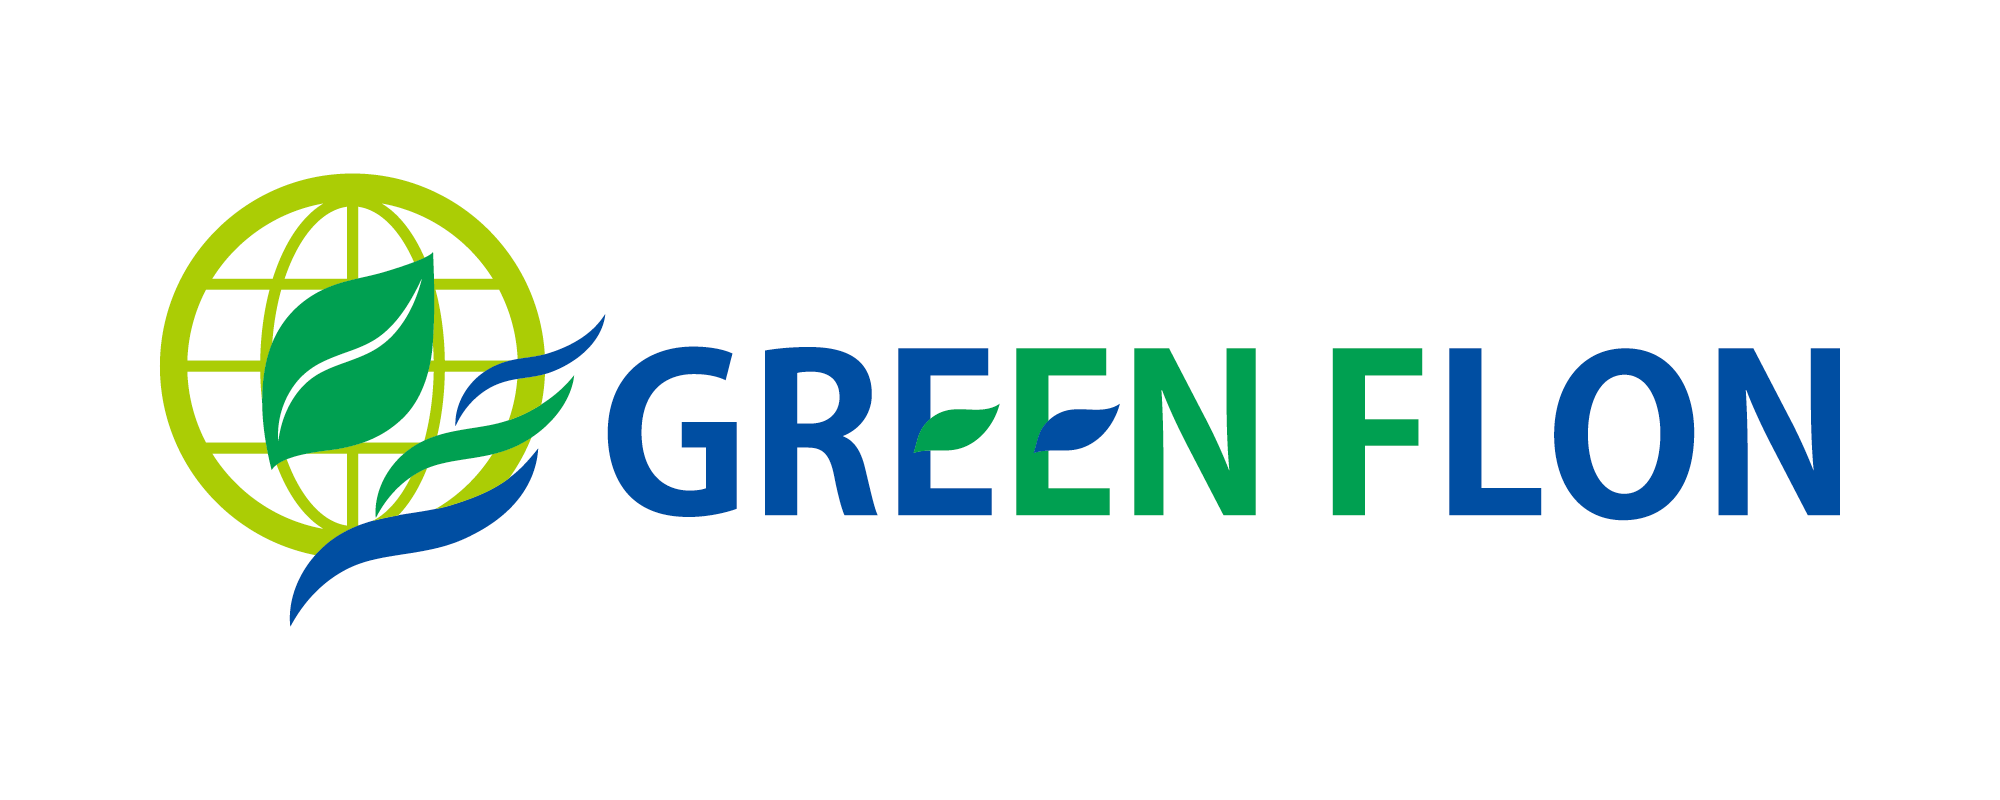 https://www.a-bex.com/wp/wp-content/uploads/2021/07/logo_greenflon-03.png